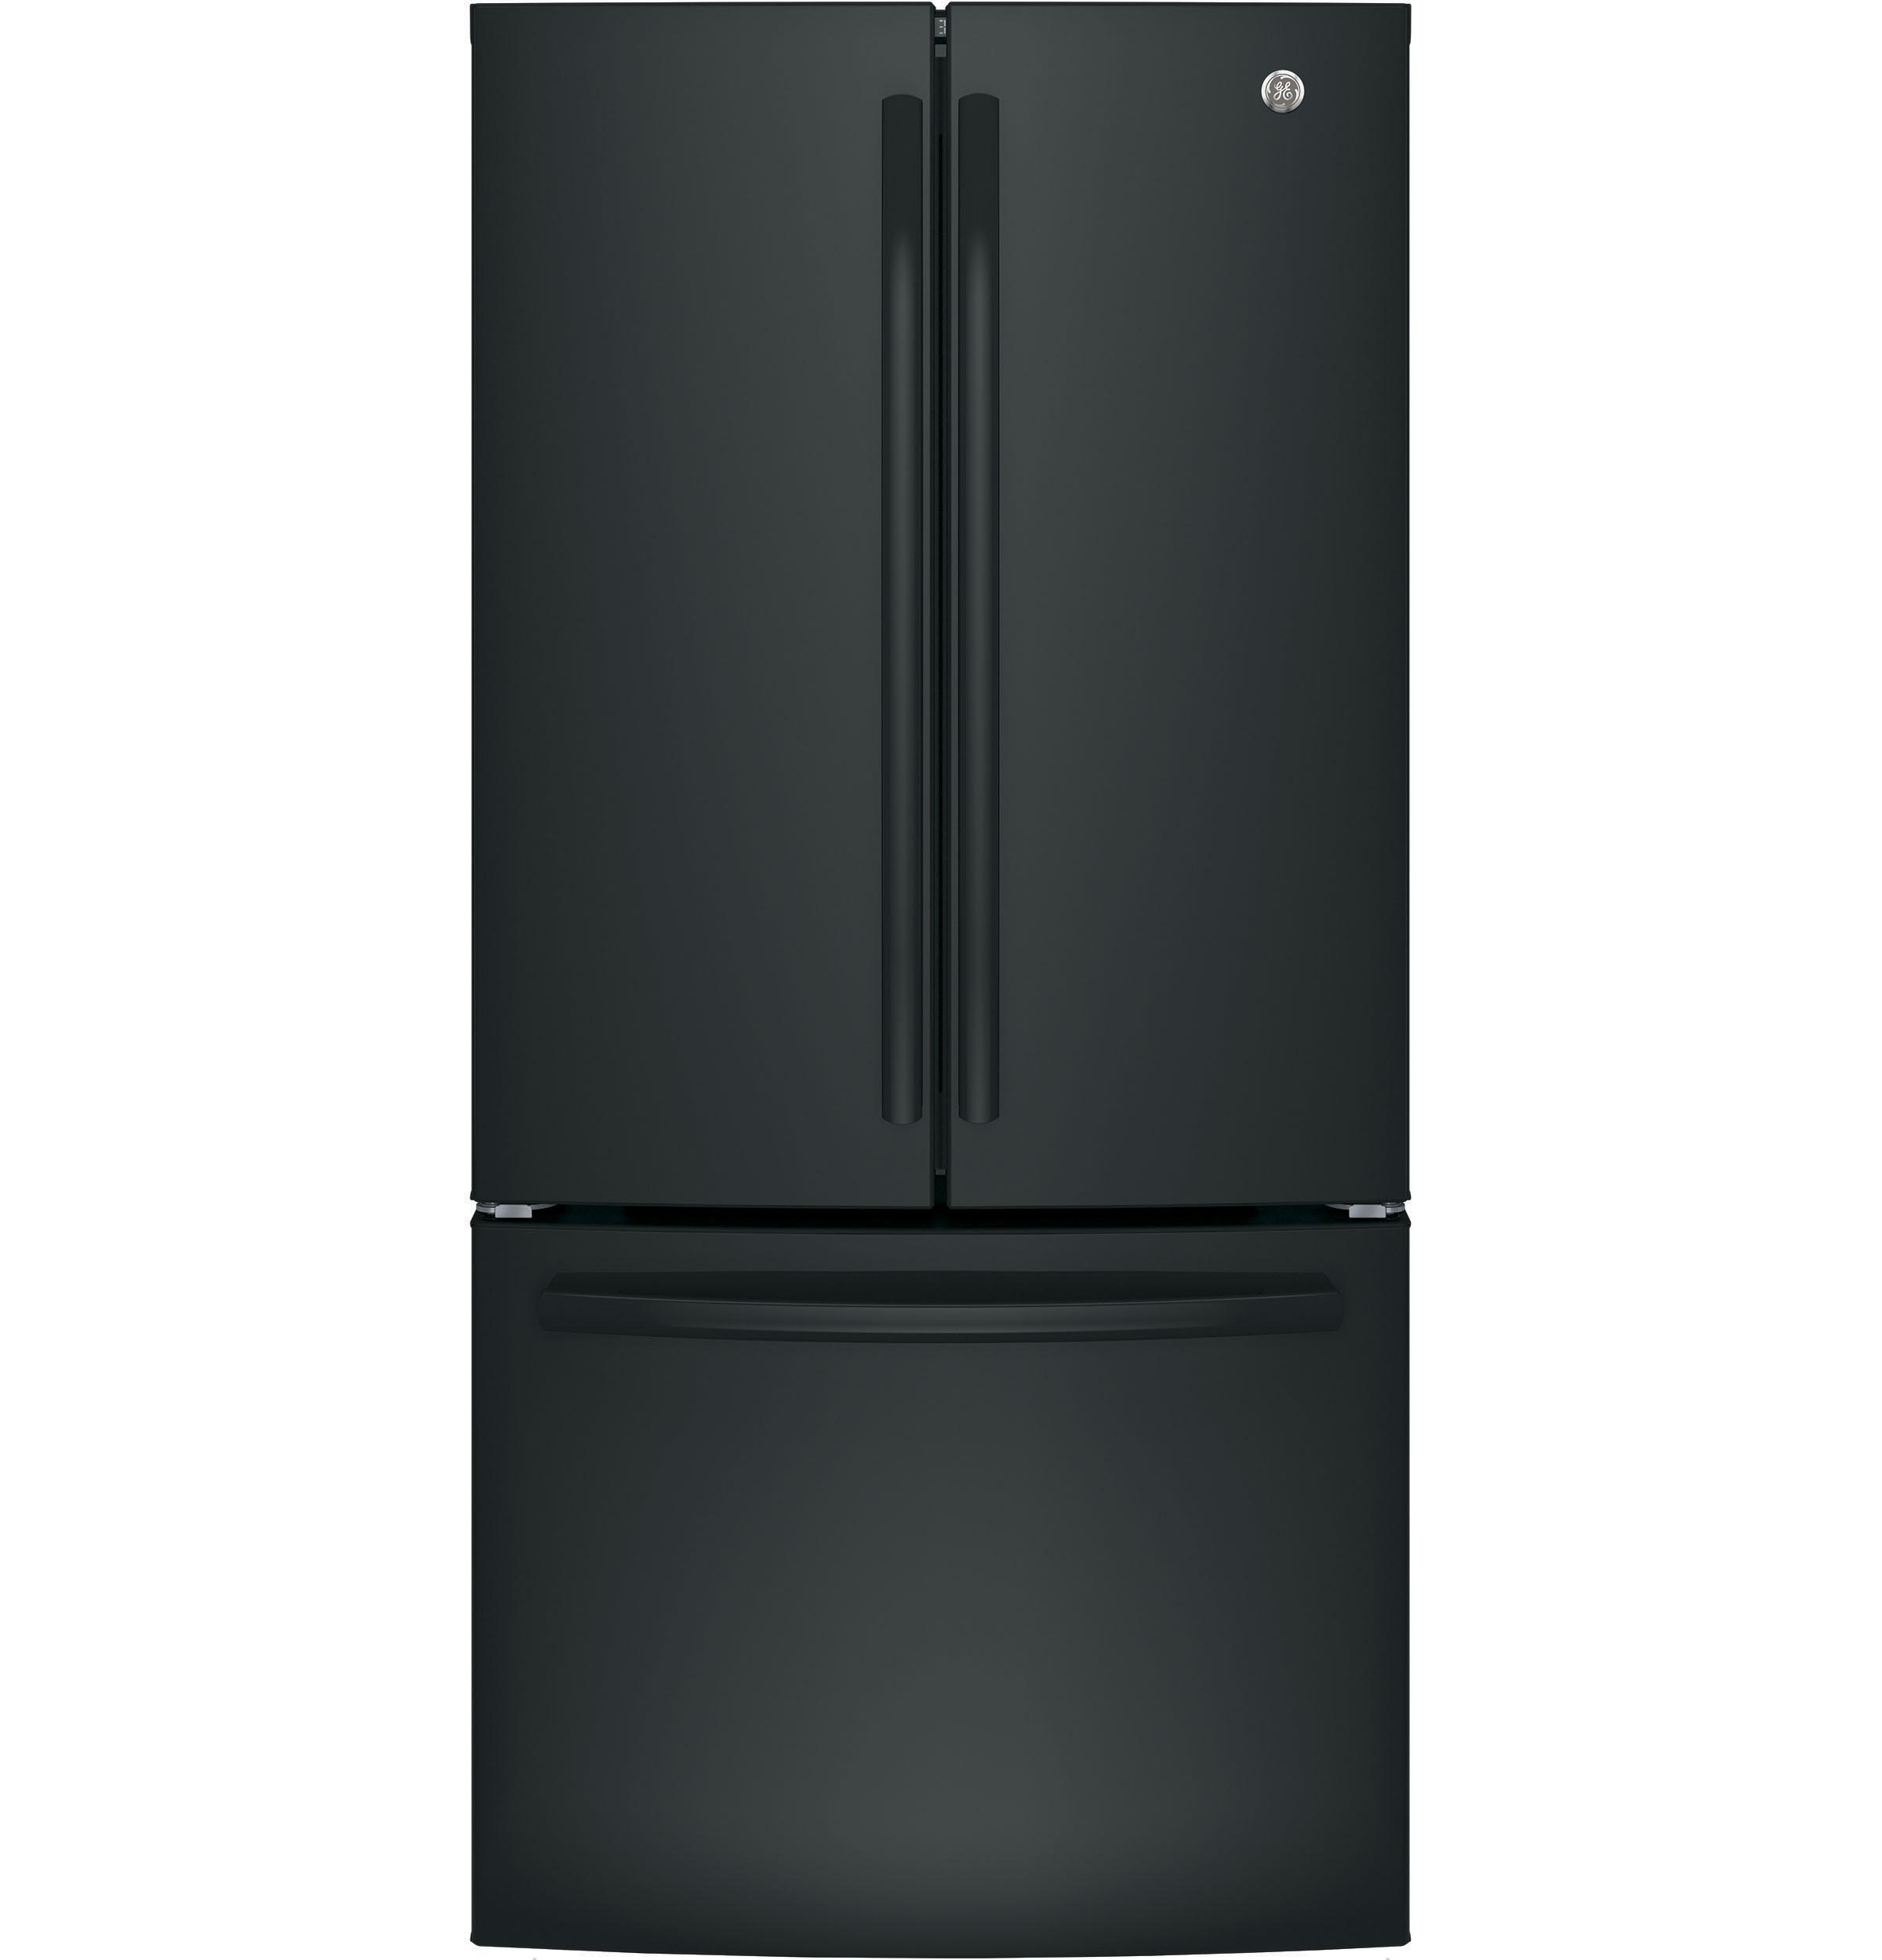 GE GE® ENERGY STAR® 24.7 Cu. Ft. French-Door Refrigerator